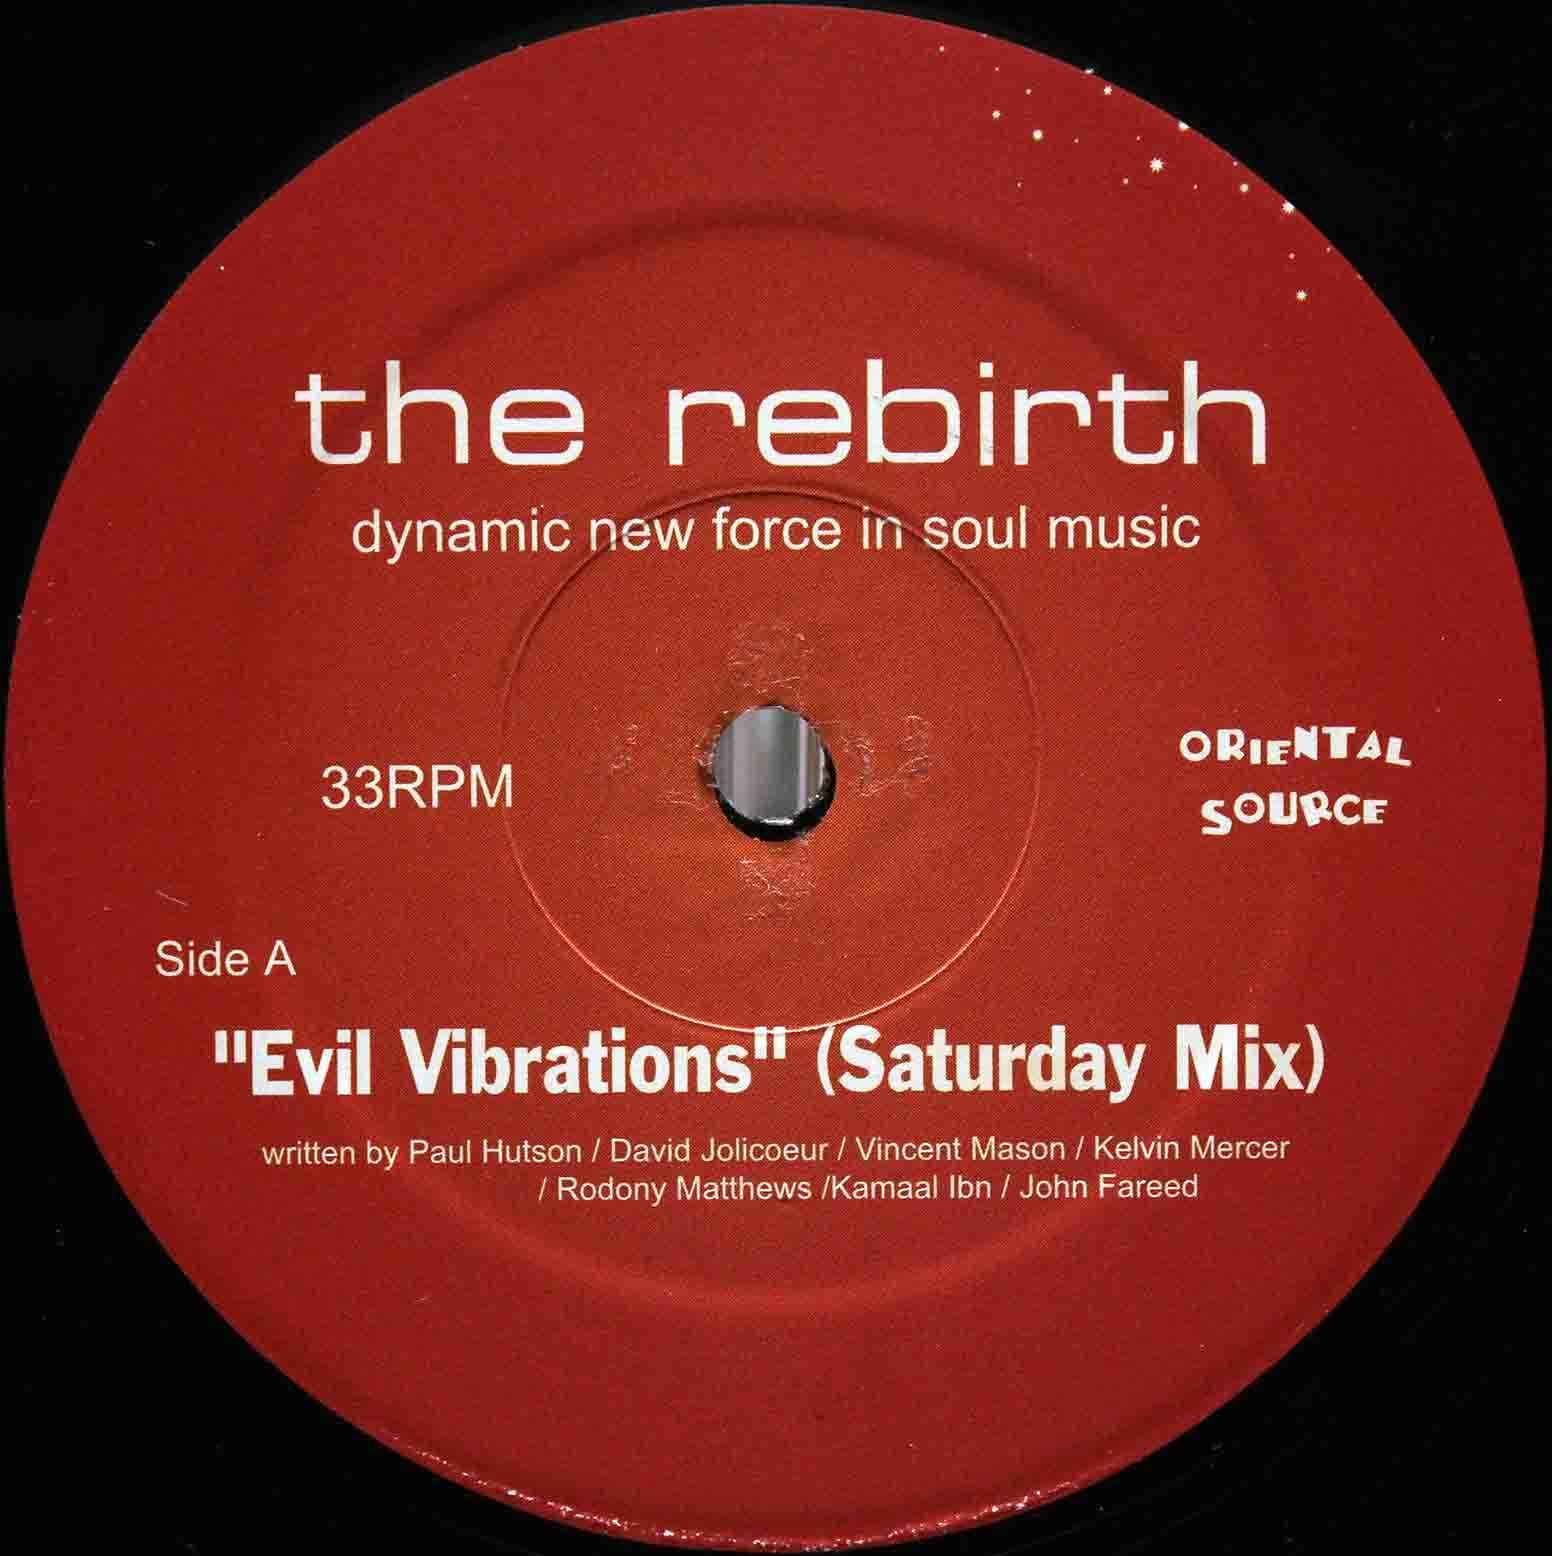 The Rebirth Evil Vibrations (Saturday Mix) 03